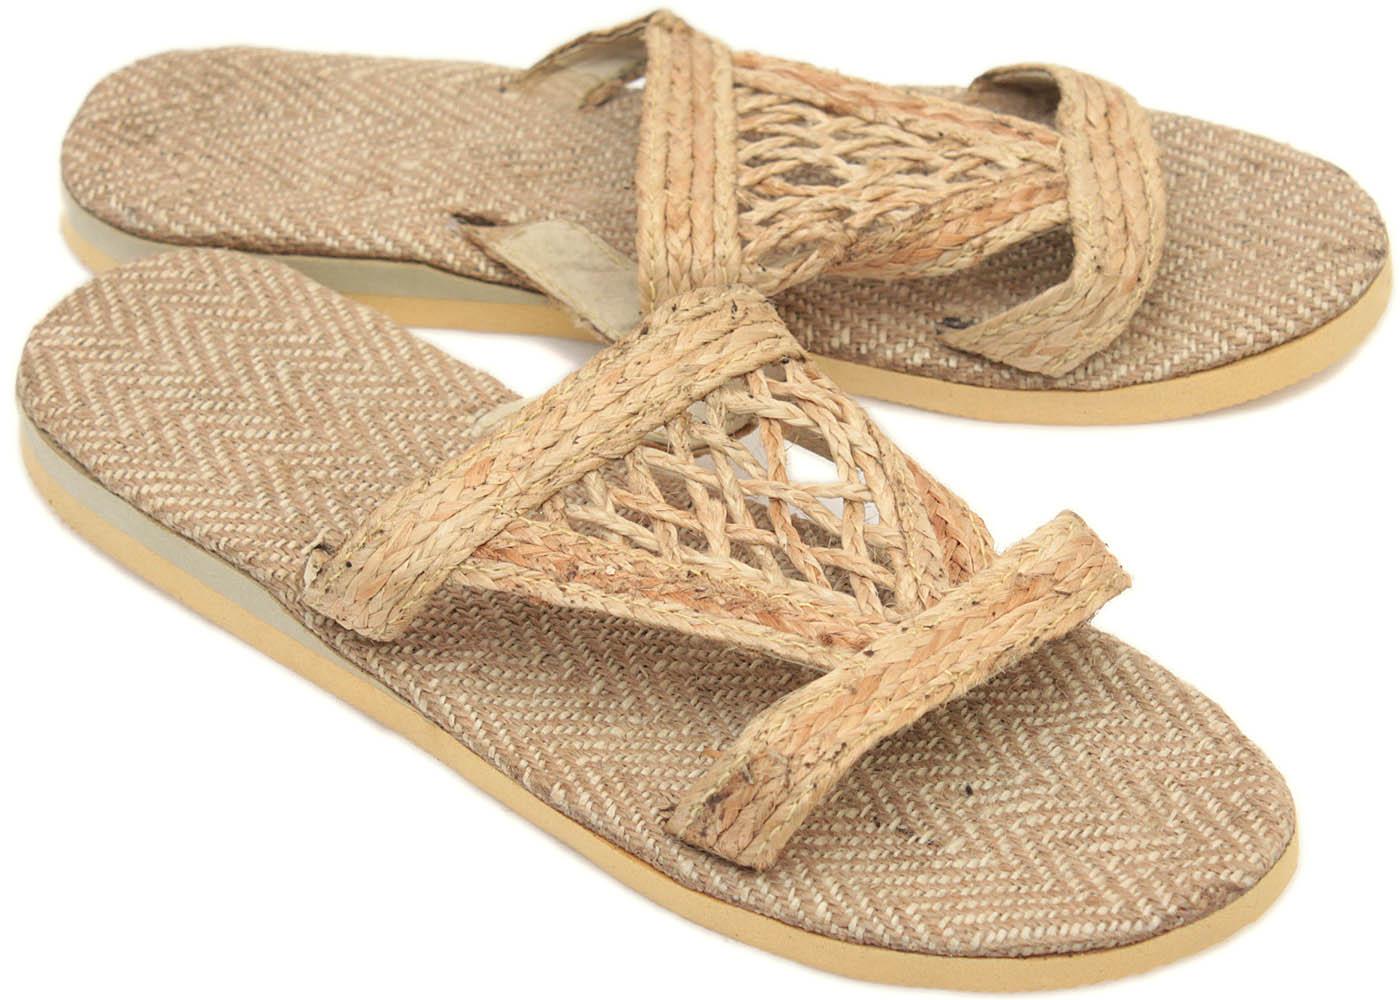 Handmade Jute Sandals